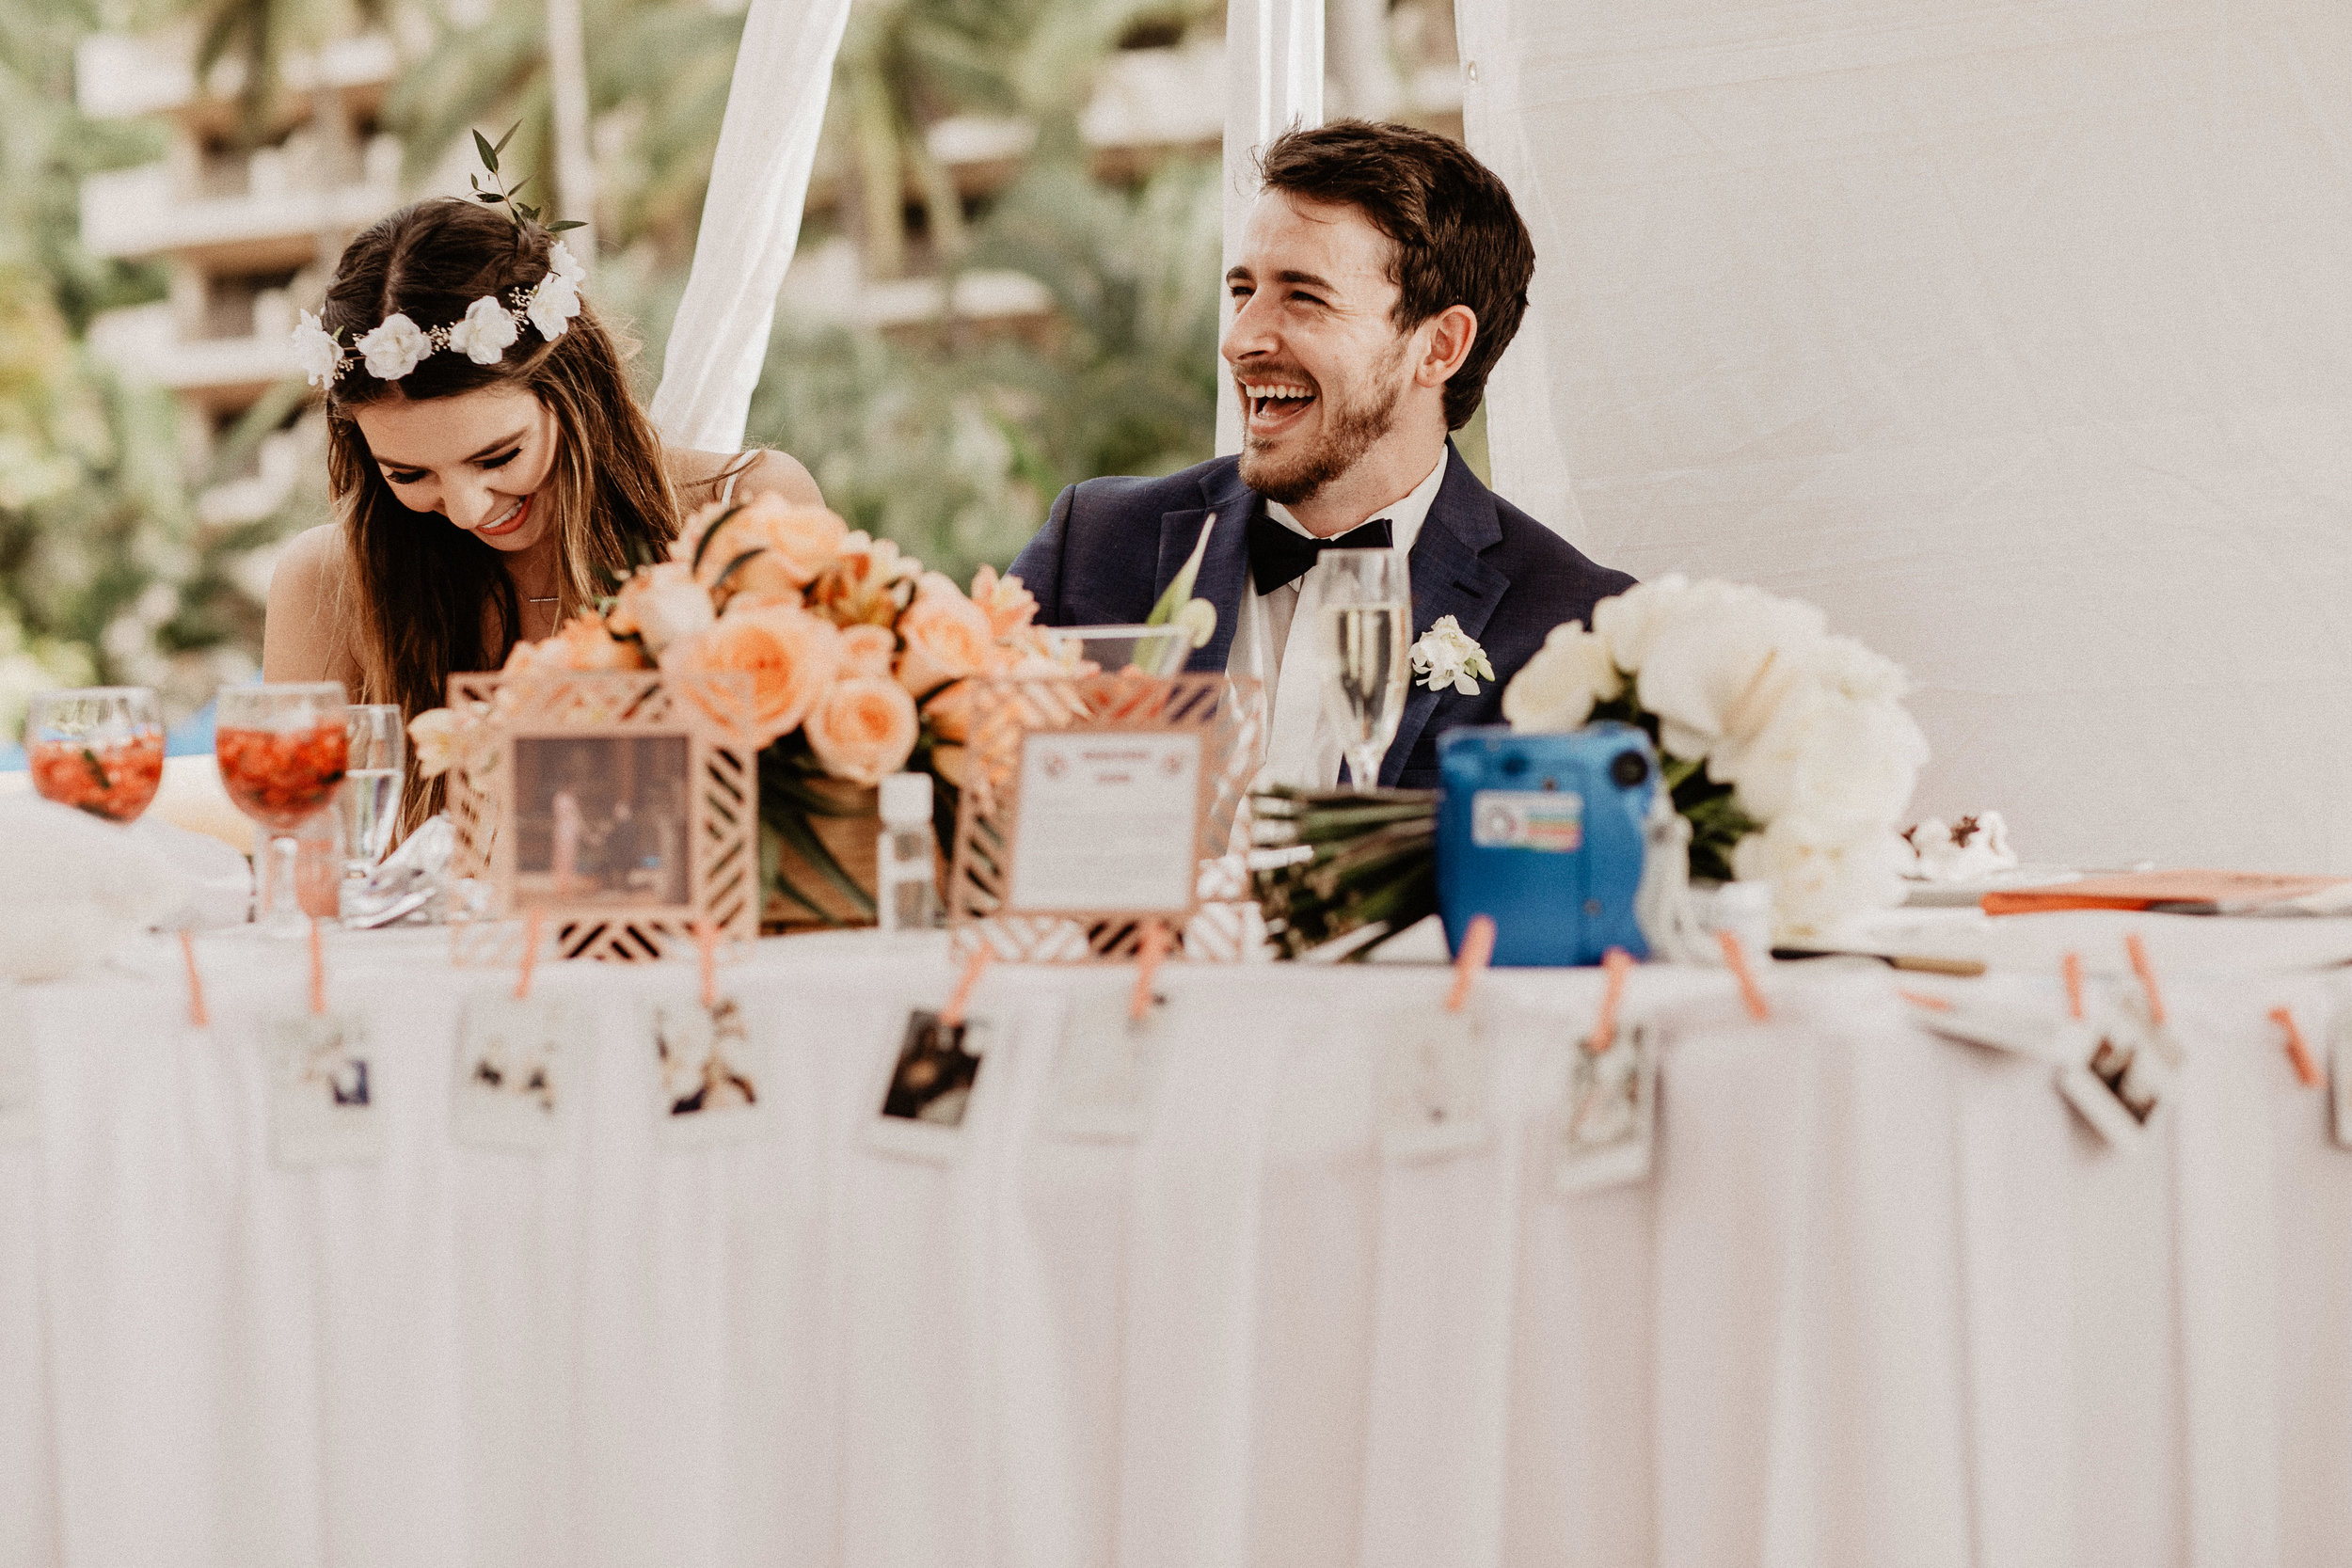 alfonso_flores_destination_wedding_photography_puerto_vallarta_hotel_barcelo_vallarta_cuttler_amela-605.JPG